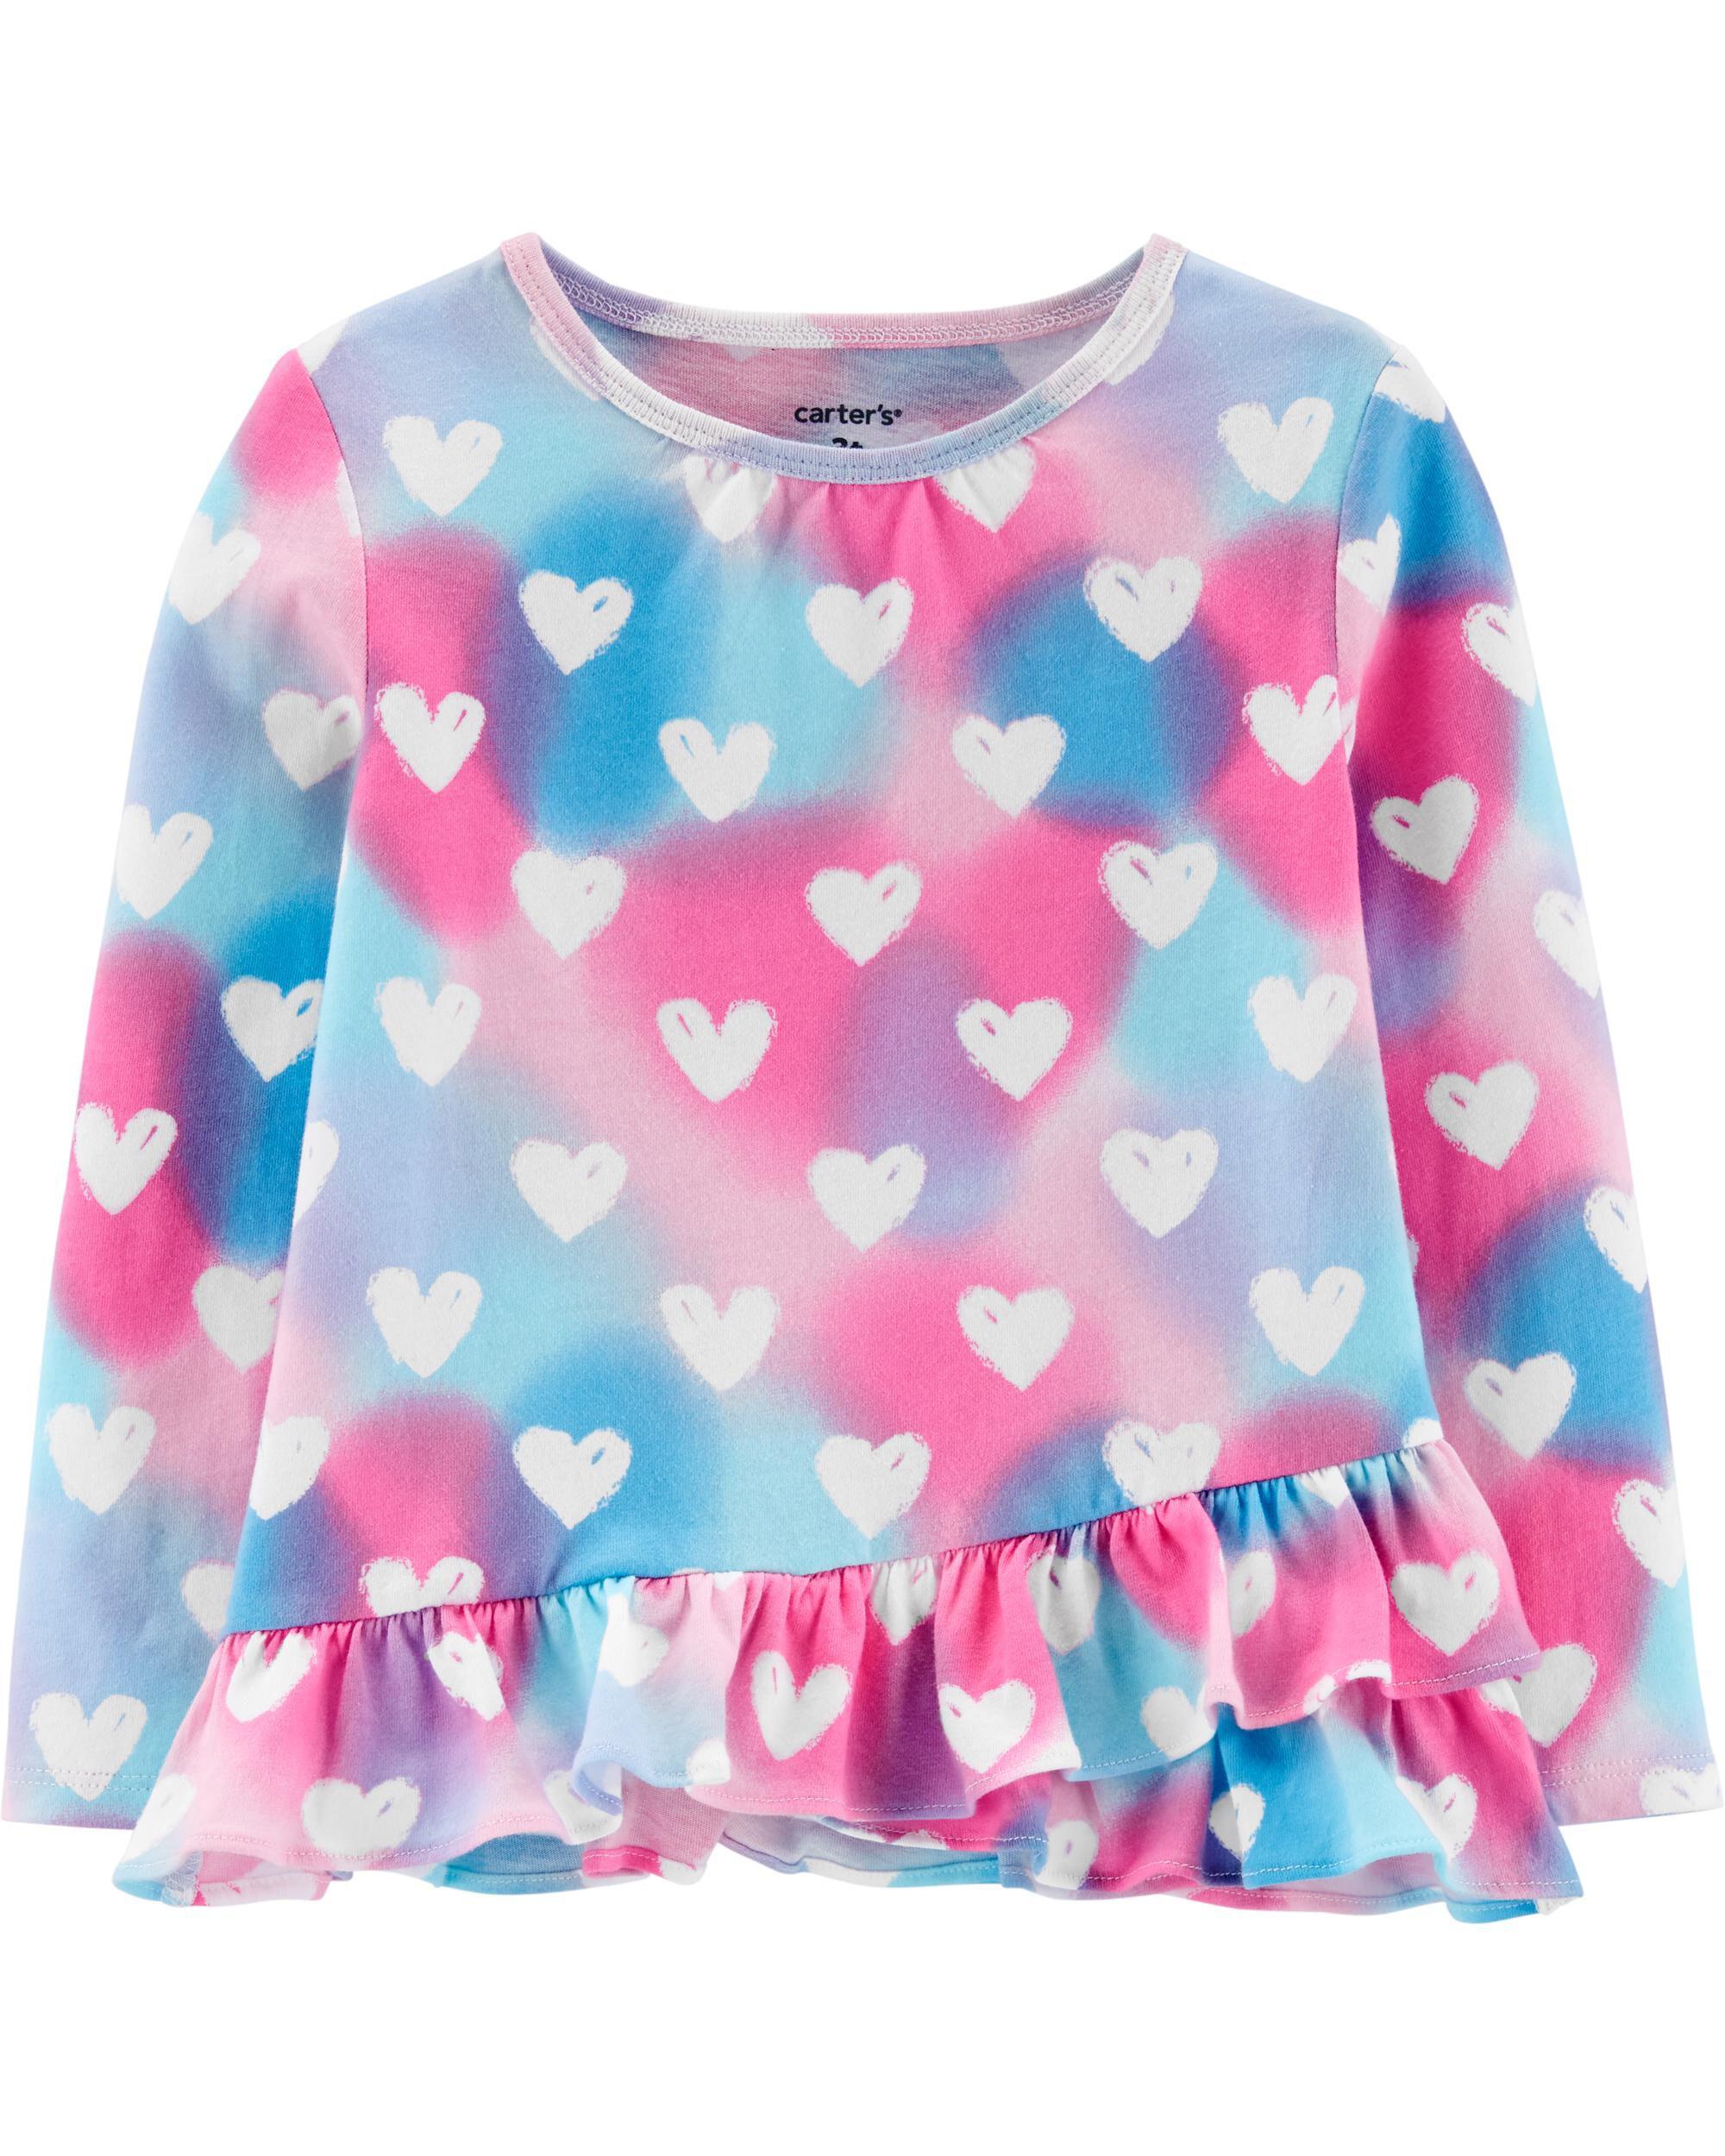 Heart Horse Red Toddler//Infant Girls Short Sleeve Shirts Ruffles Shirt Tee Jersey for 2-6T